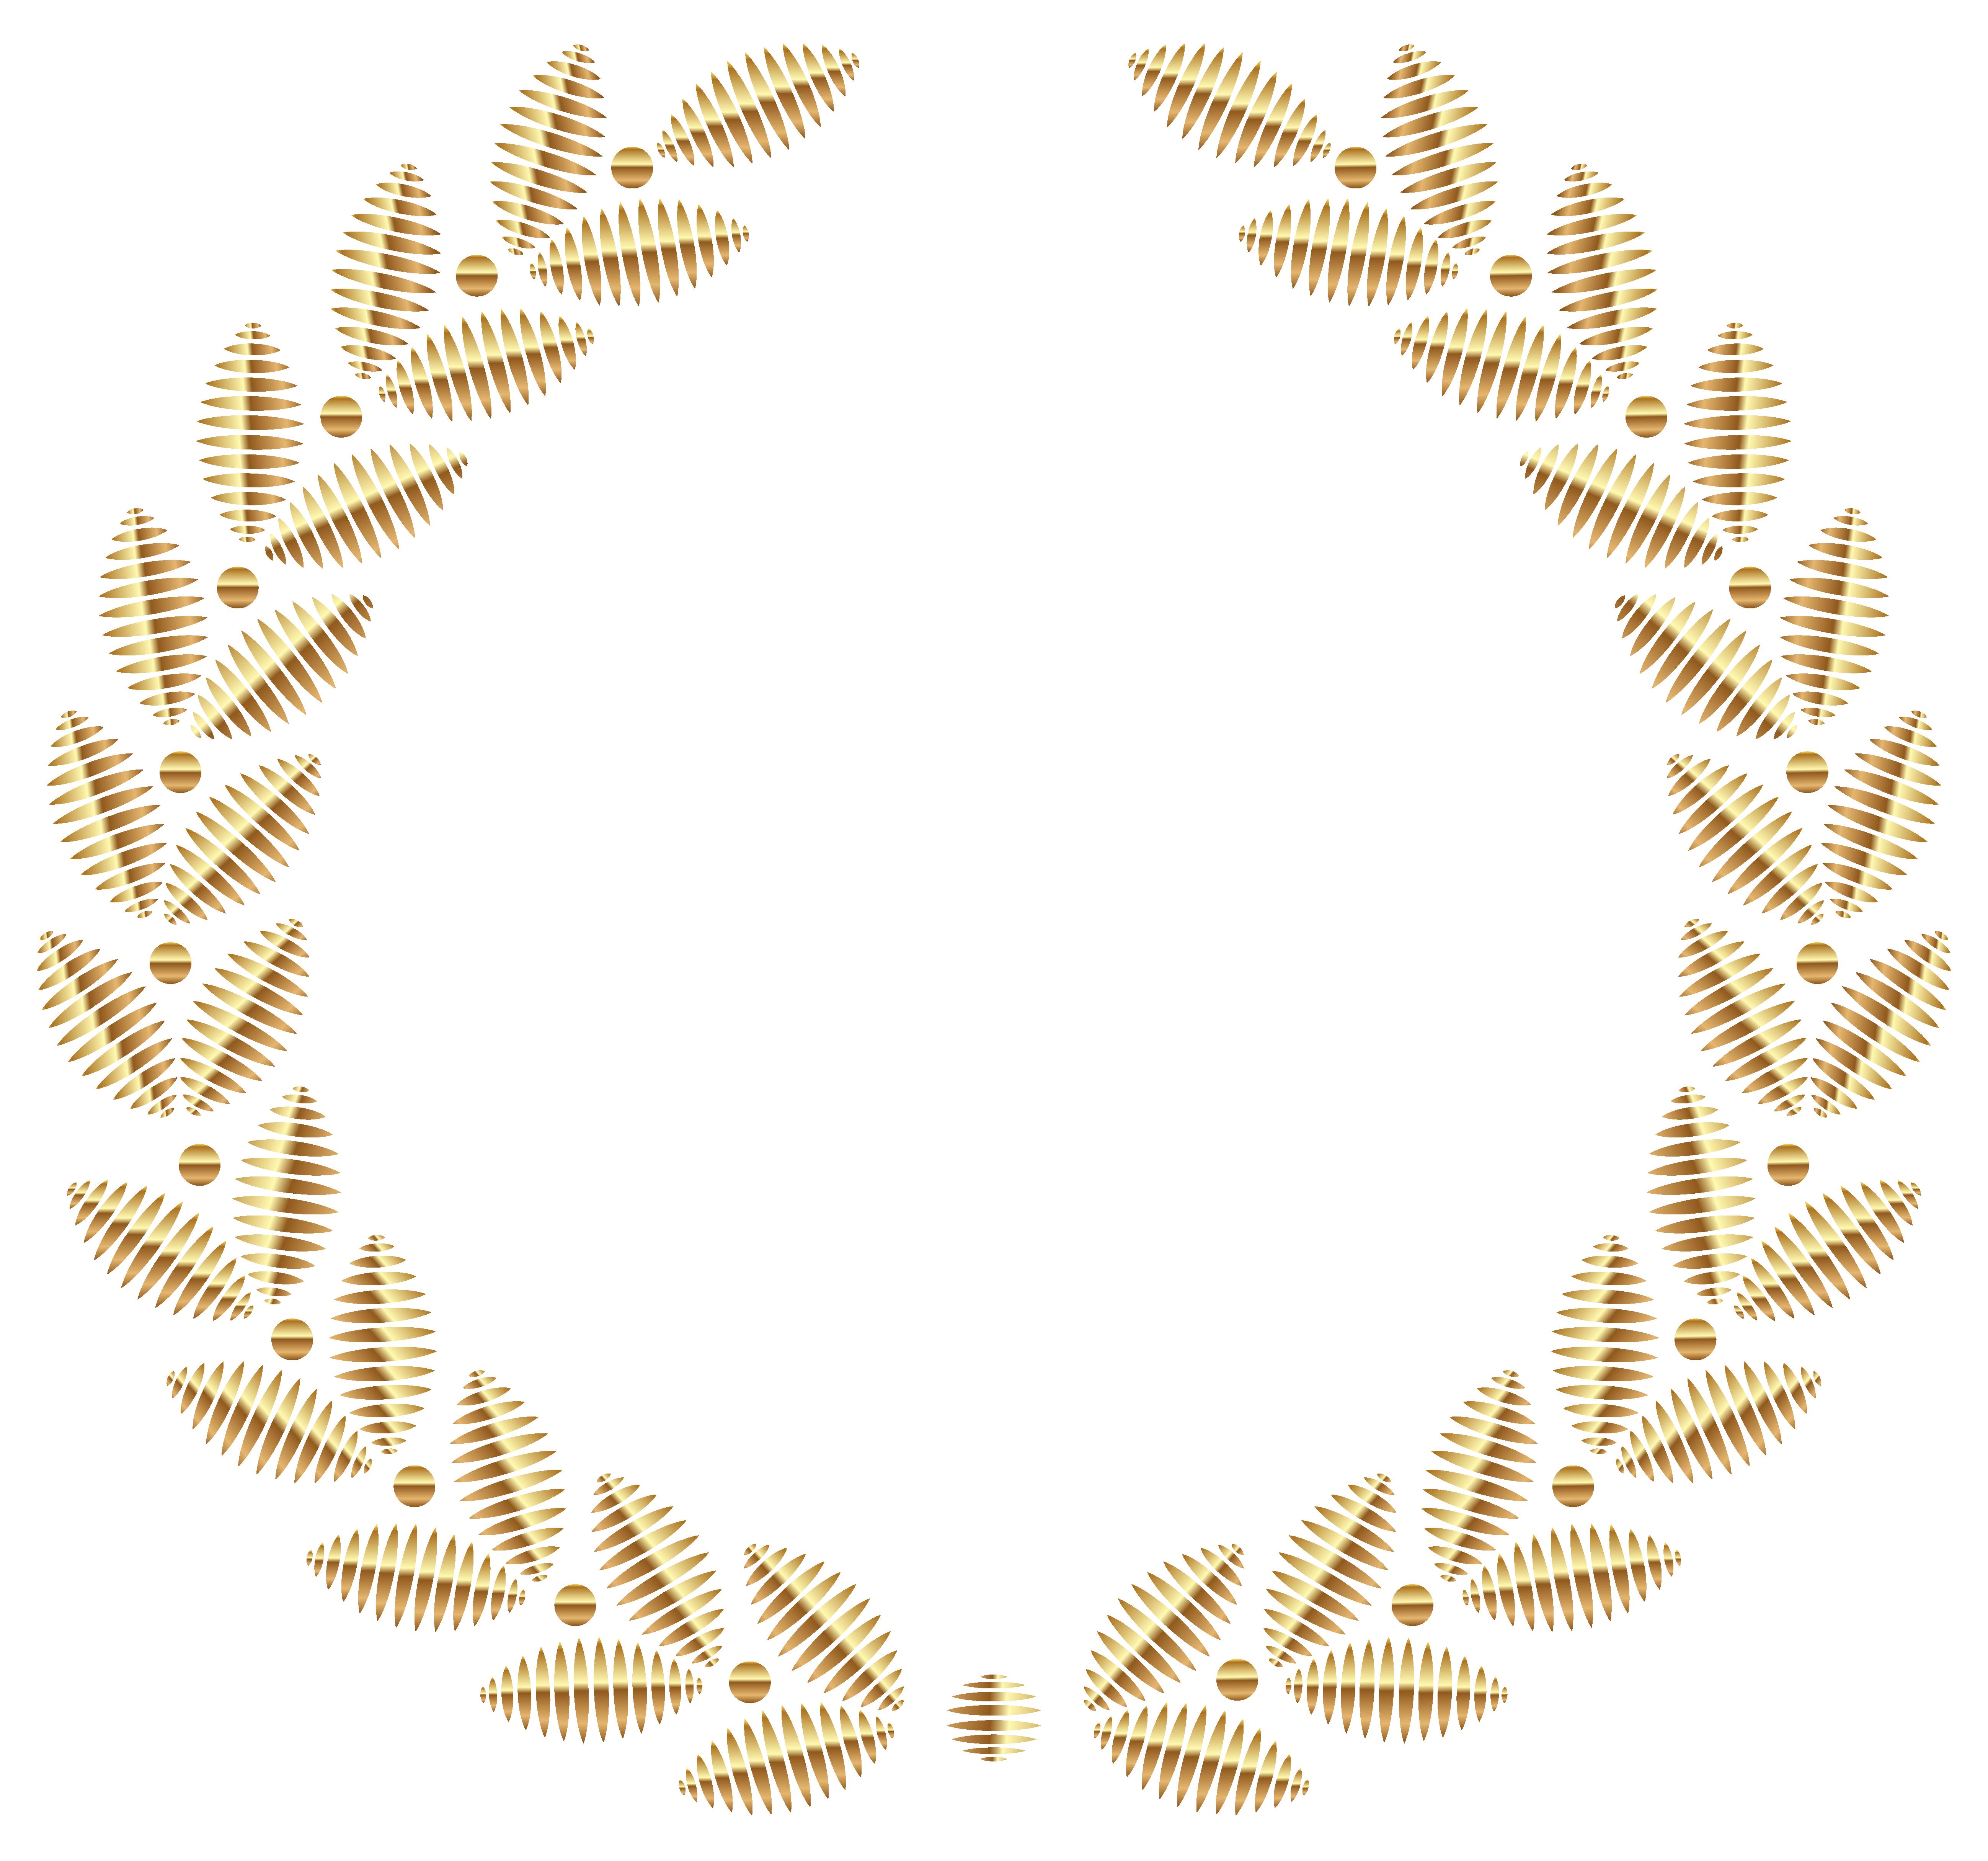 Clipart borders wheat. Golden wreath png transparent